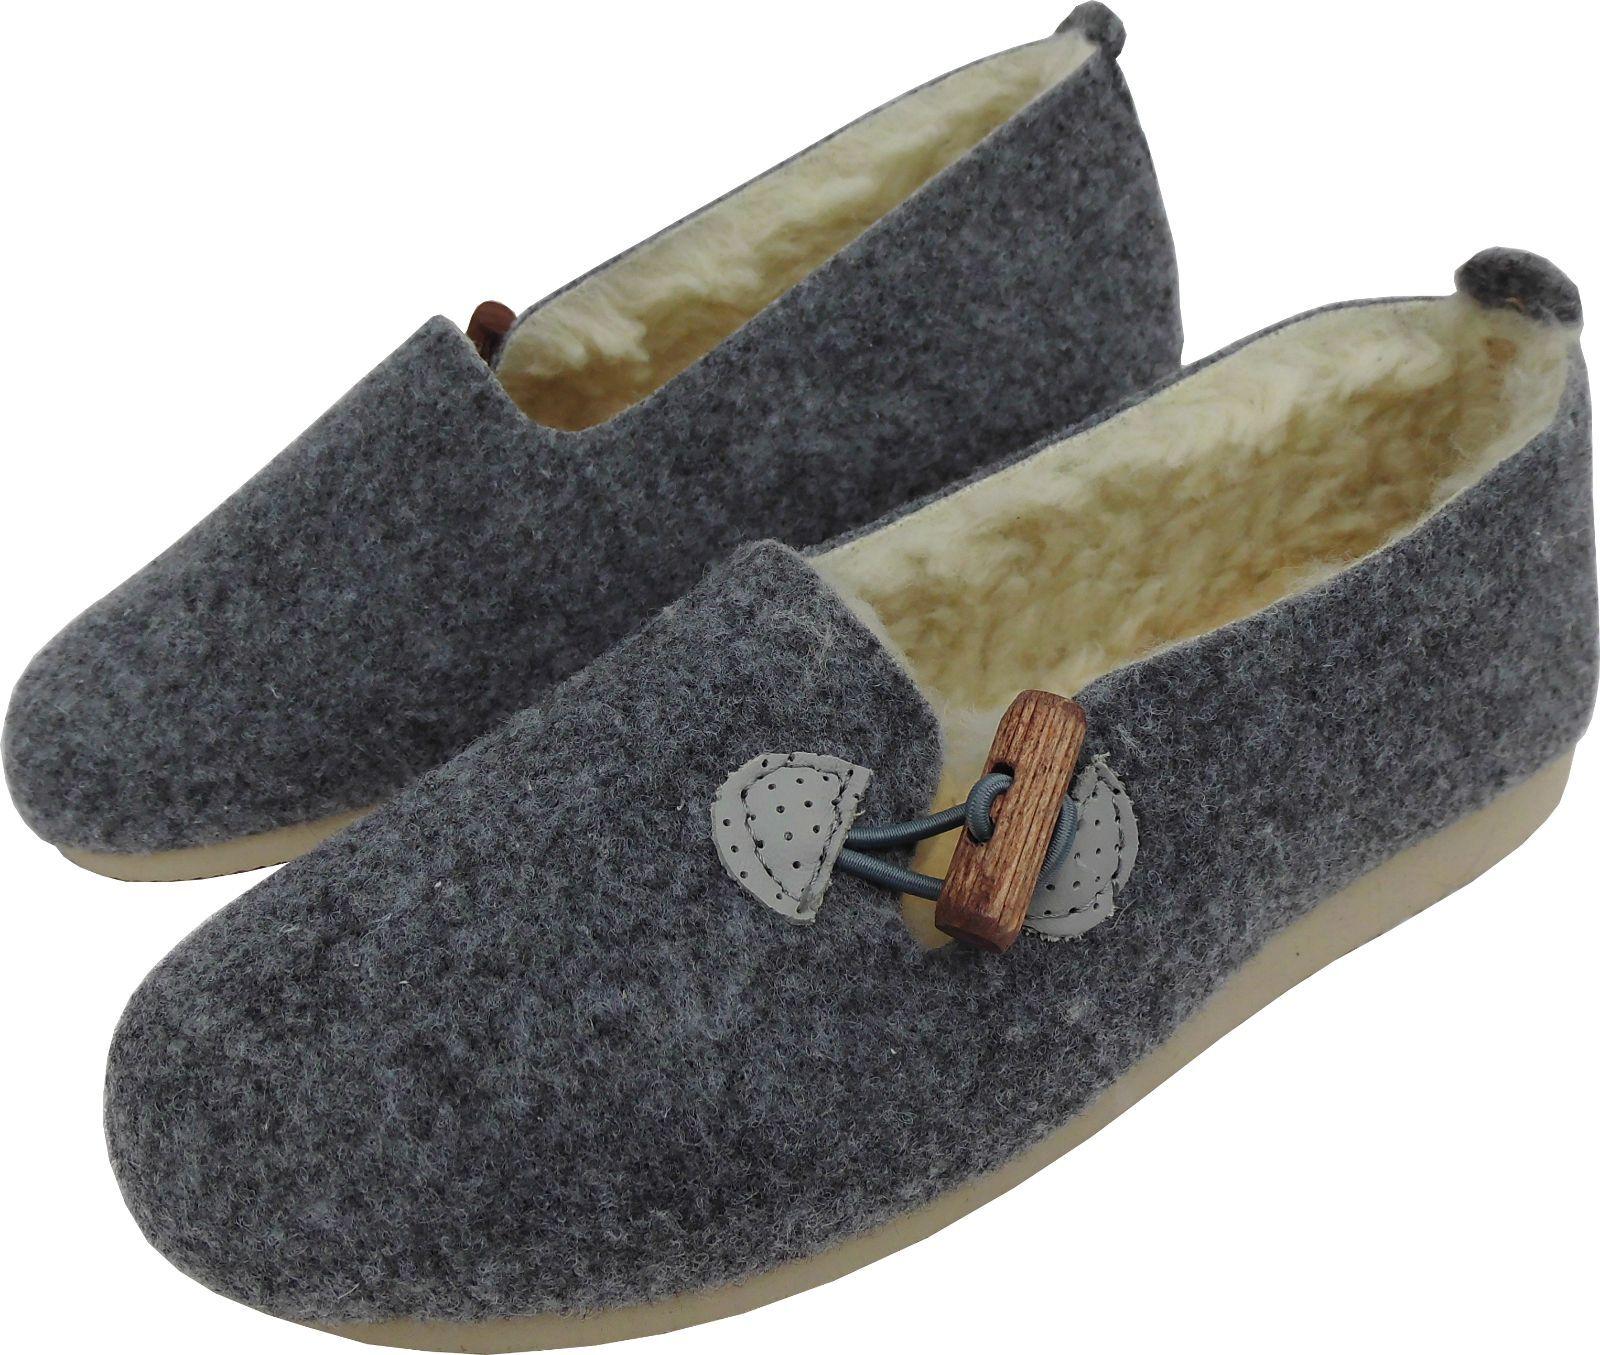 Leichte, WARME Hausschuhe - Pantolette, GR.37 *Wollfilz+Schu<wbr/>rwolle (1910-4-70/8)